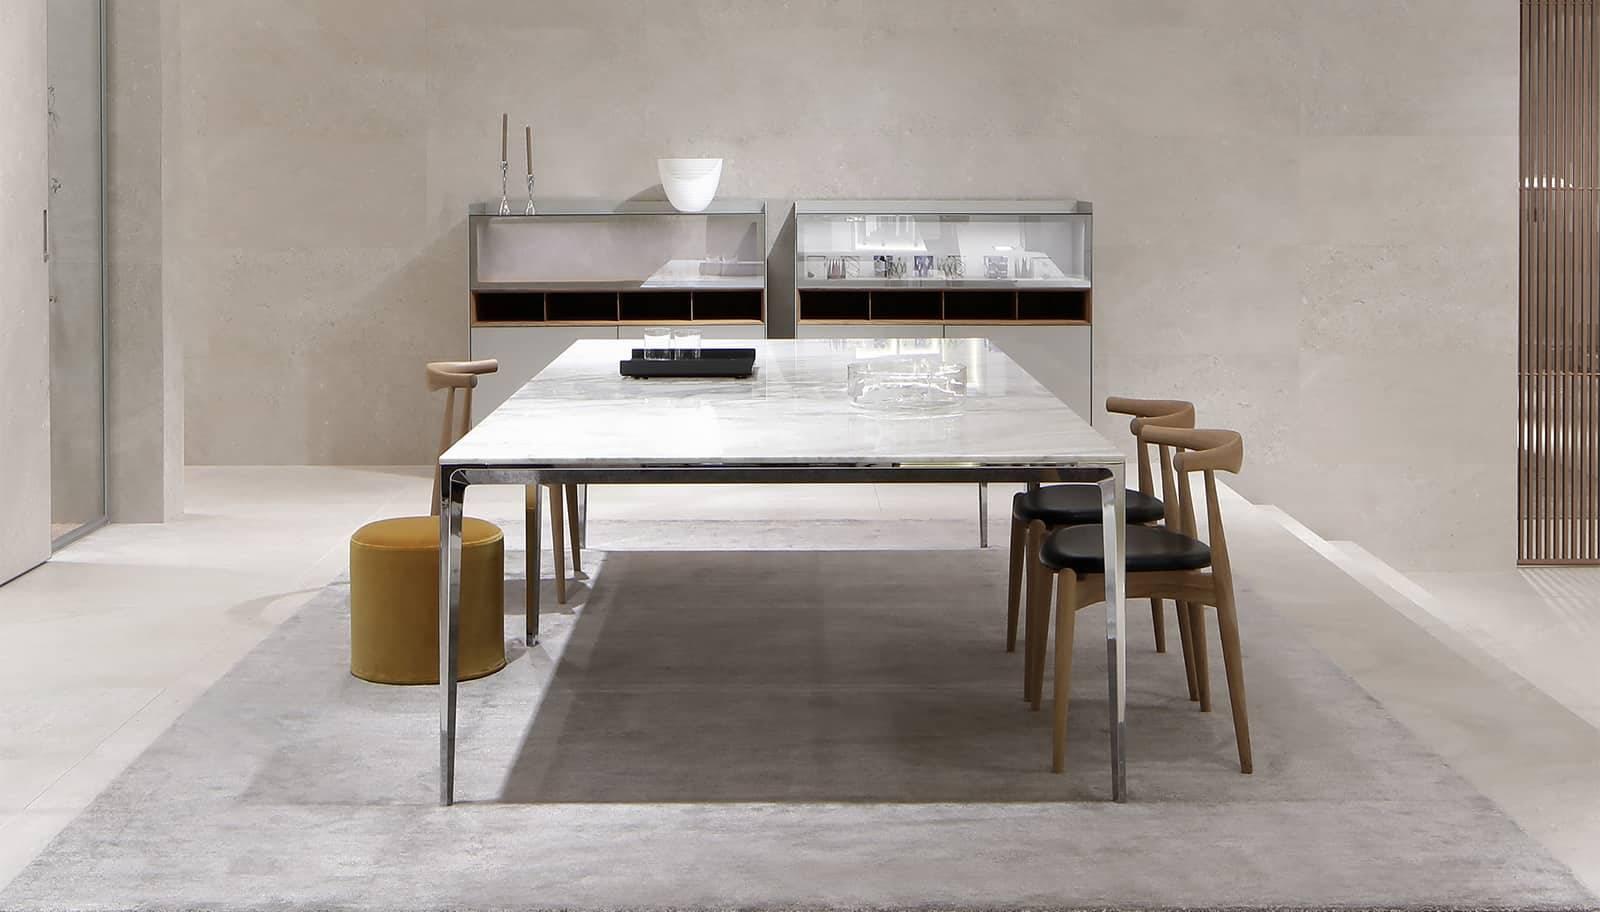 italiaanse design tafel vierkant met wit calacatta marmer blad en aluminium glanzende poten